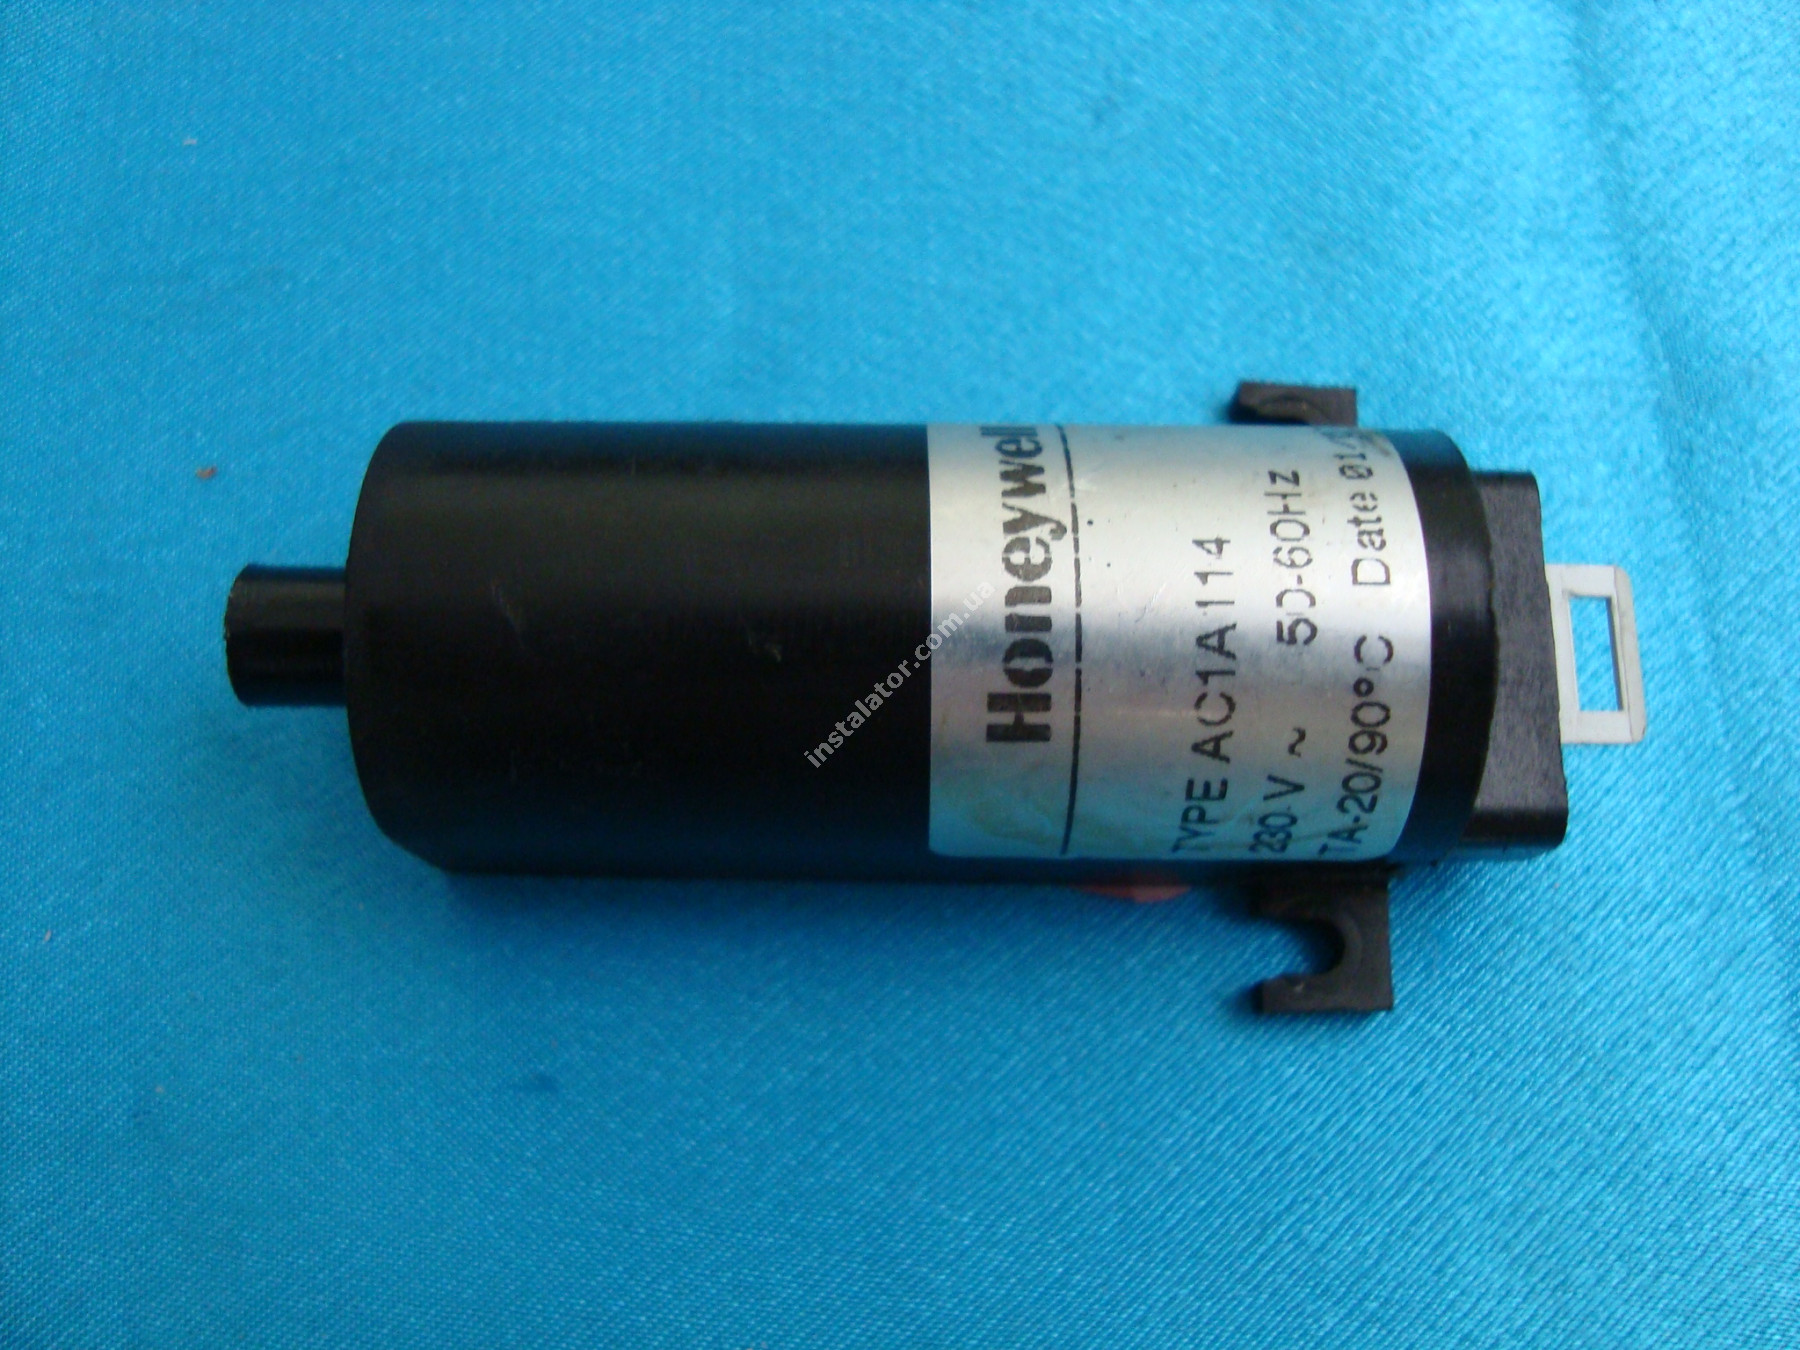 52005087 Трансформатор розпалу HERMANN Thesi/BAXI/WESTERN full-image-1